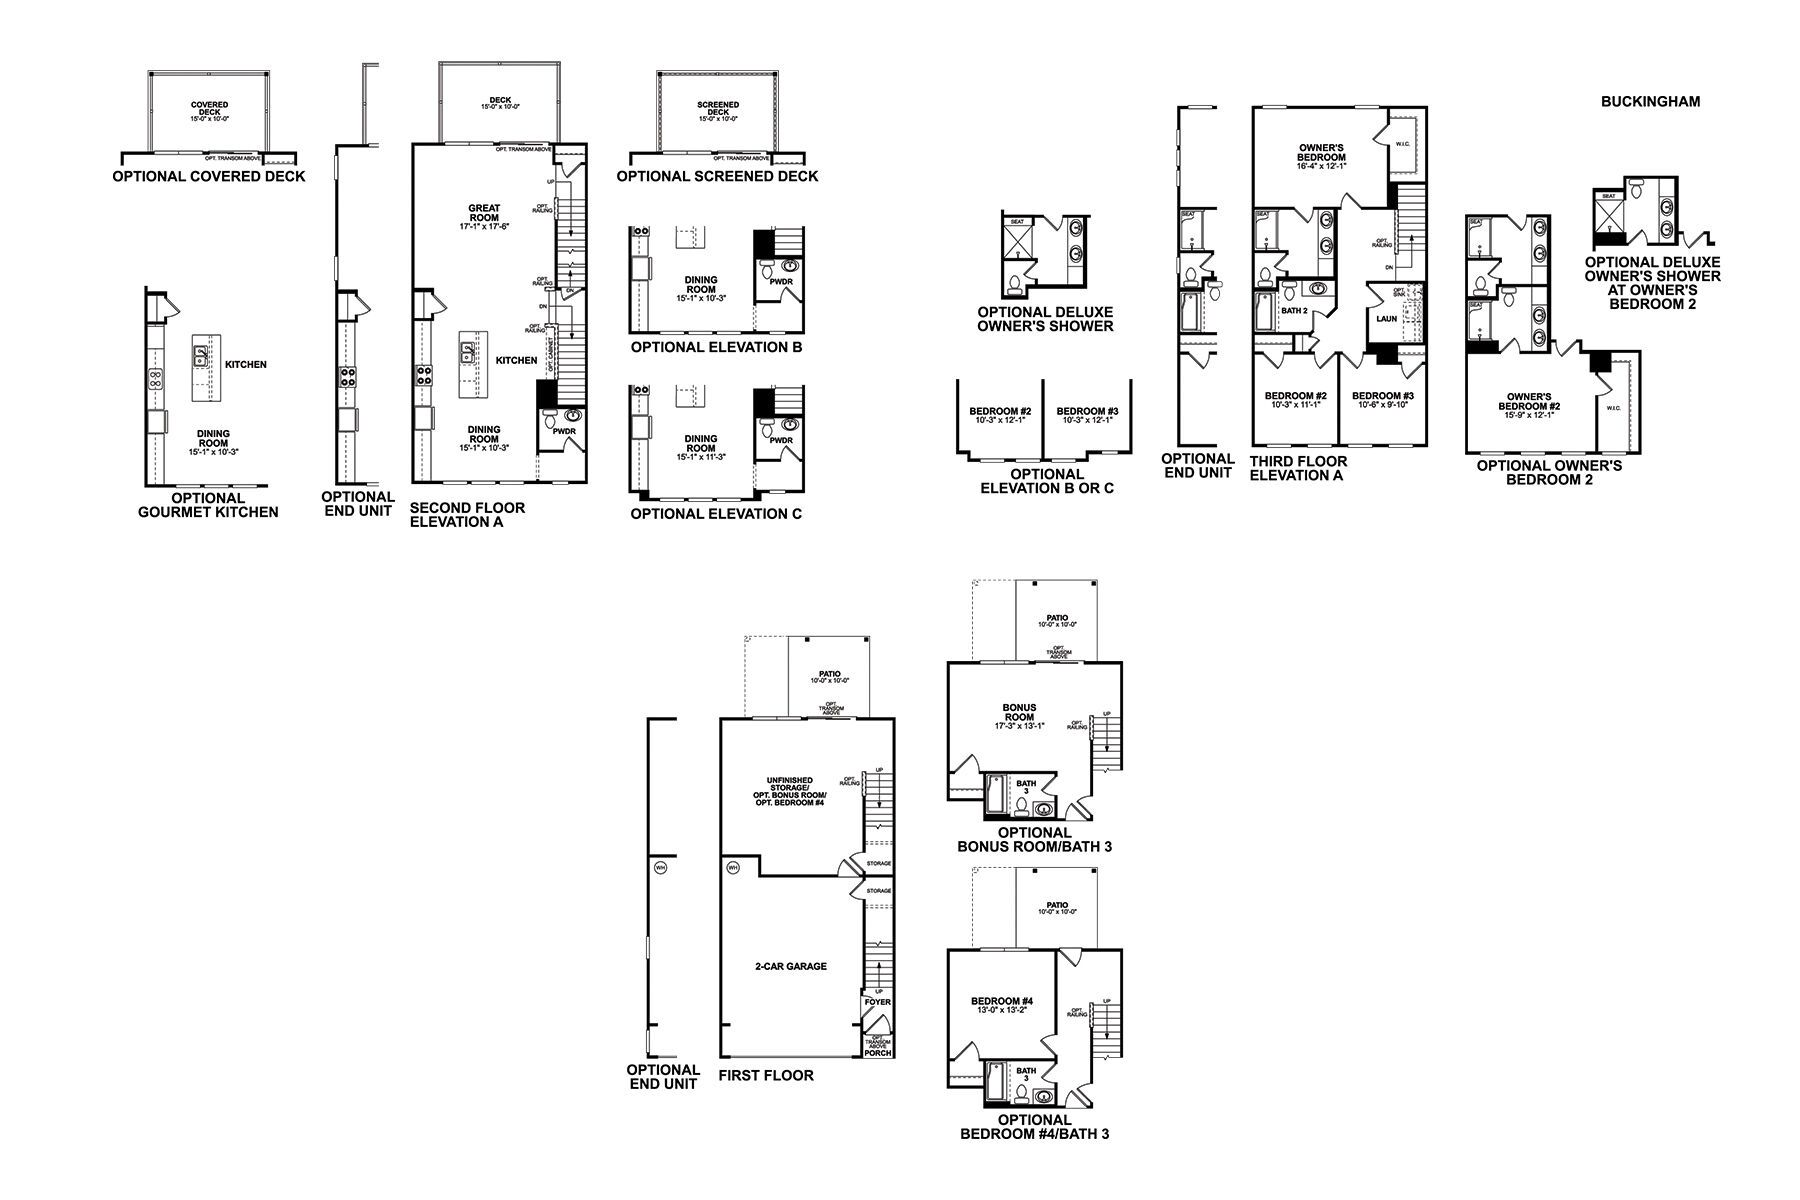 Buckingham Floorplan